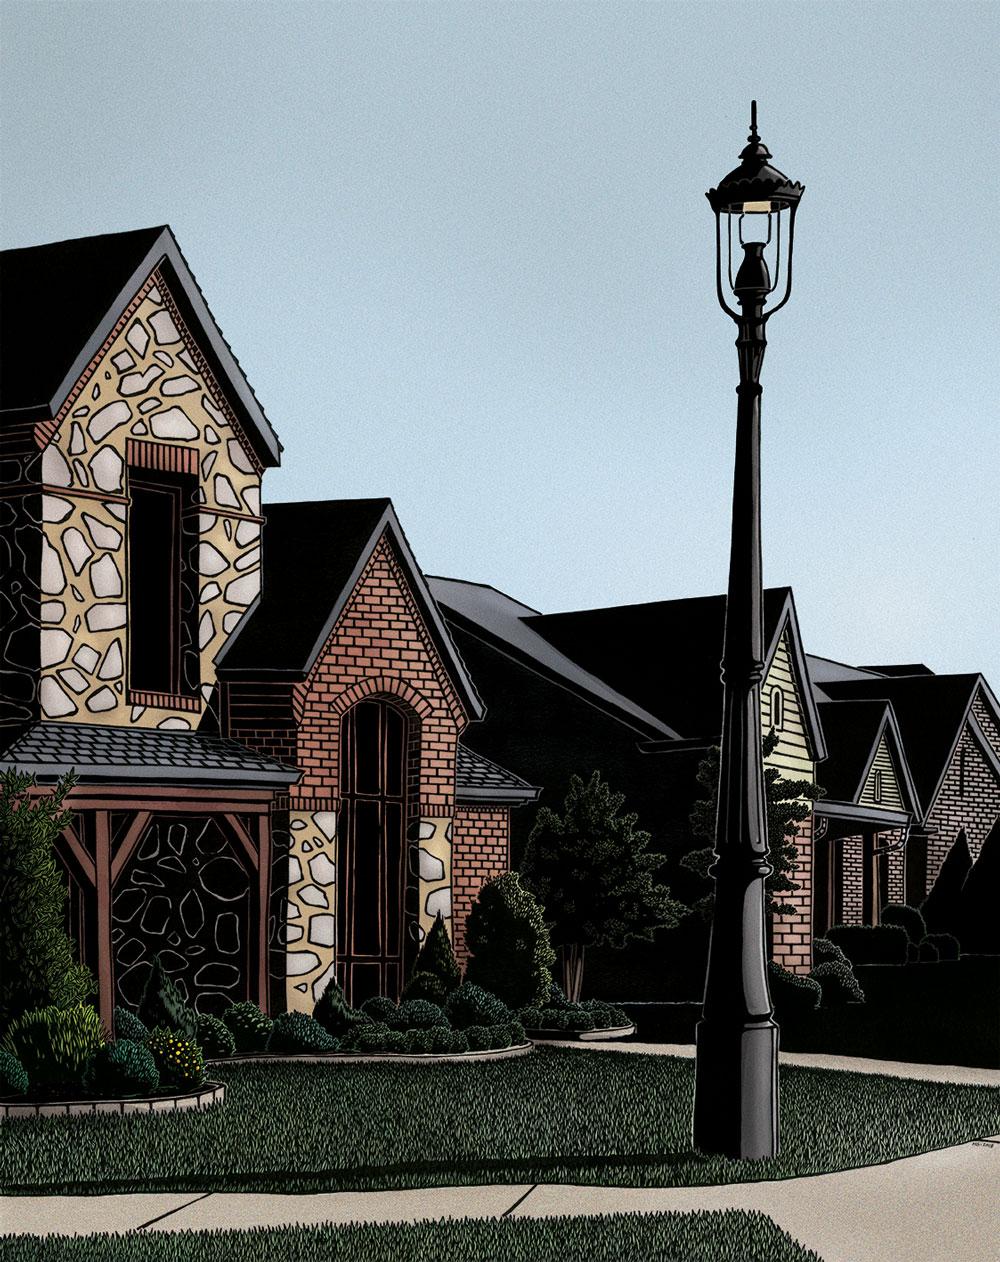 Single family house #colors2